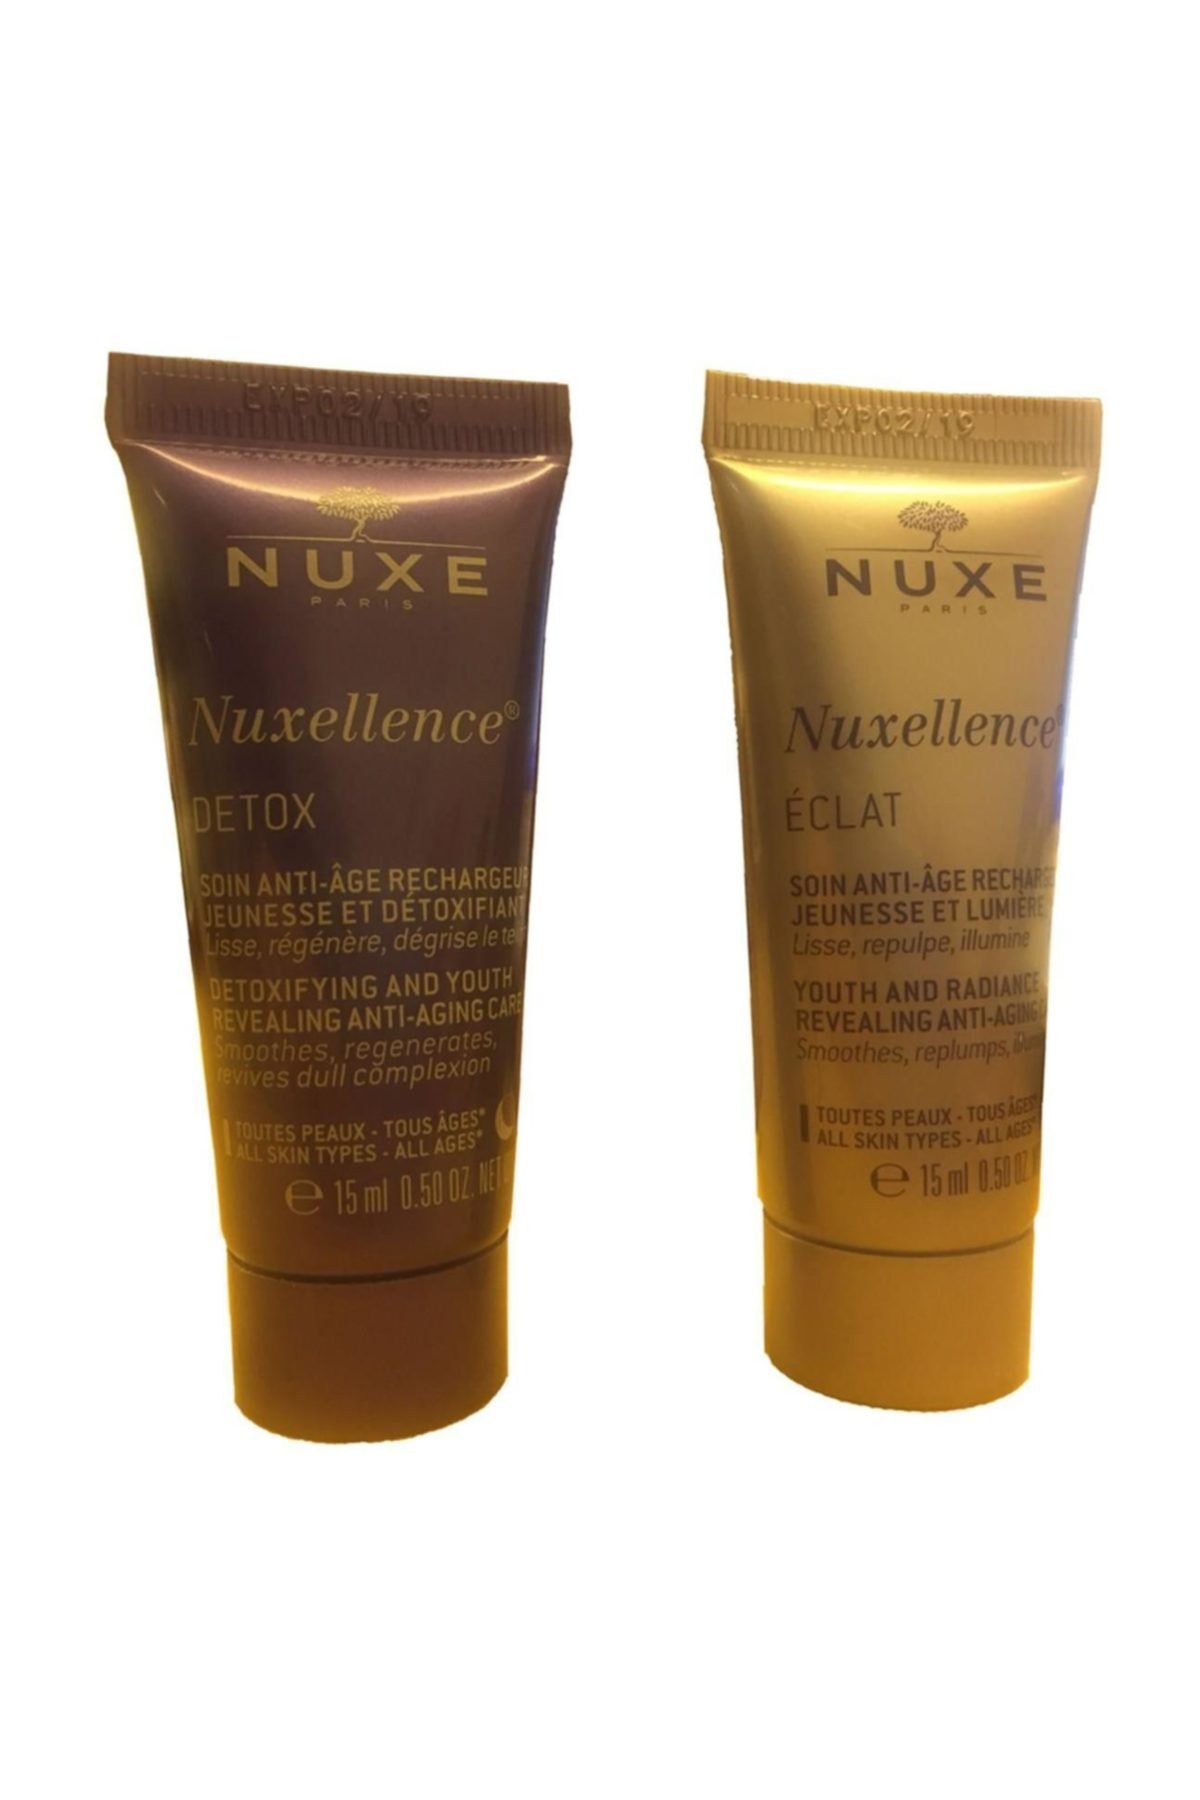 Nuxe Llence Tanışma Kiti Eclat & Detox 1